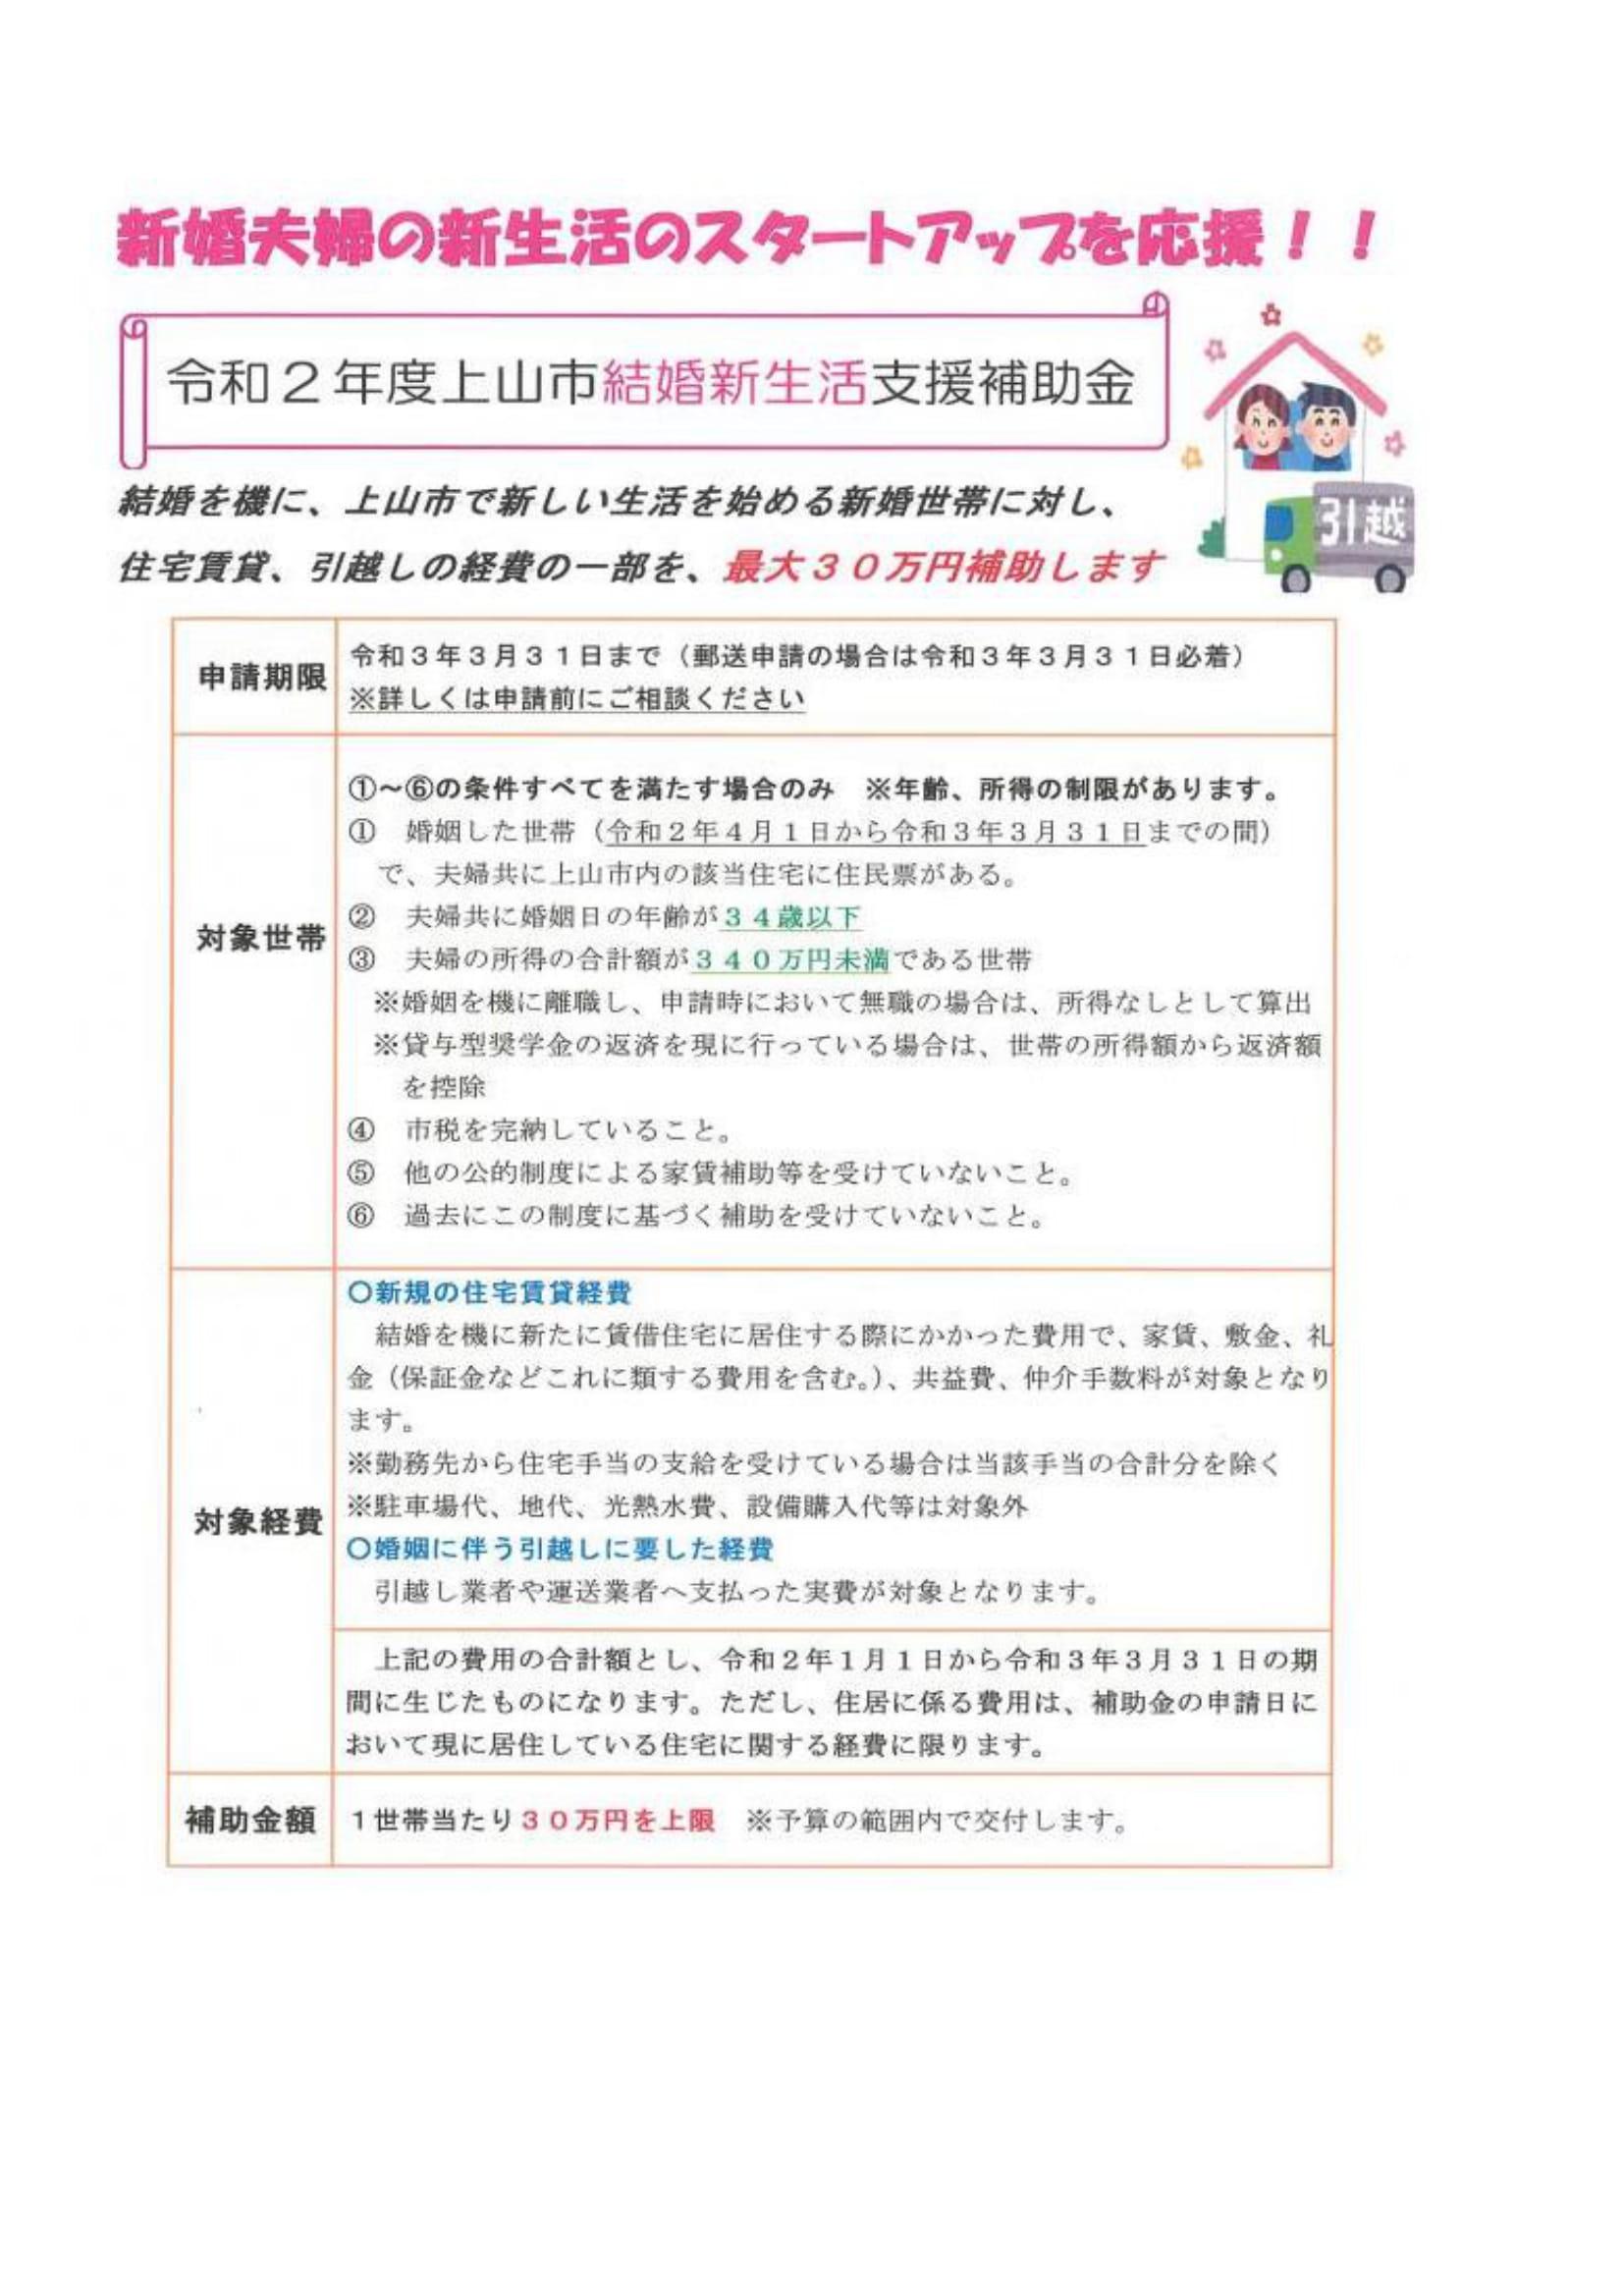 上山市 結婚新生活支援補助金のご案内:画像